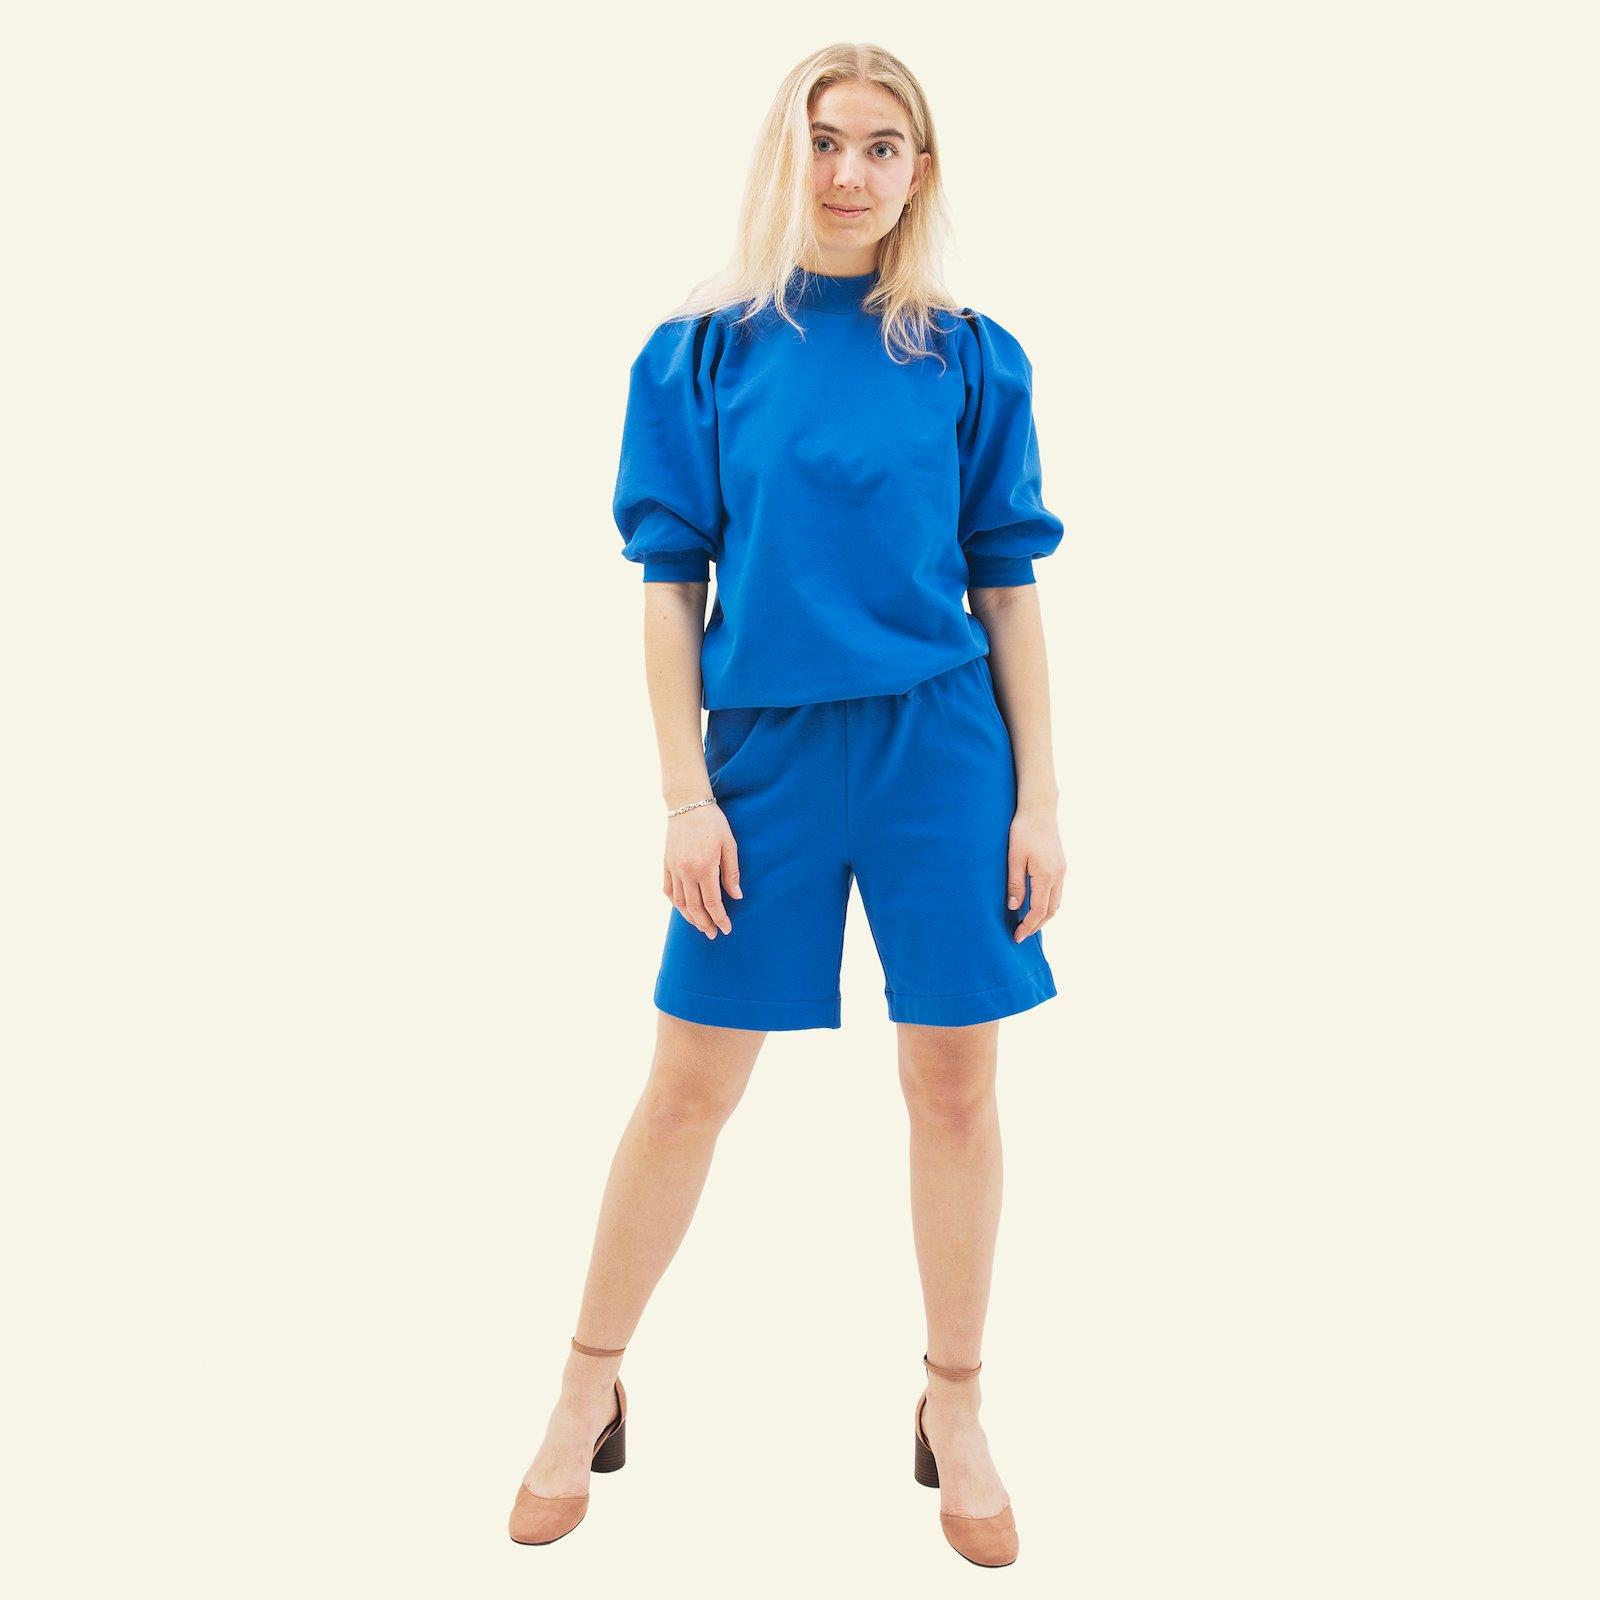 Sweatshirt with puff sleeves, S p22074_p20051_211744_230604_bundle